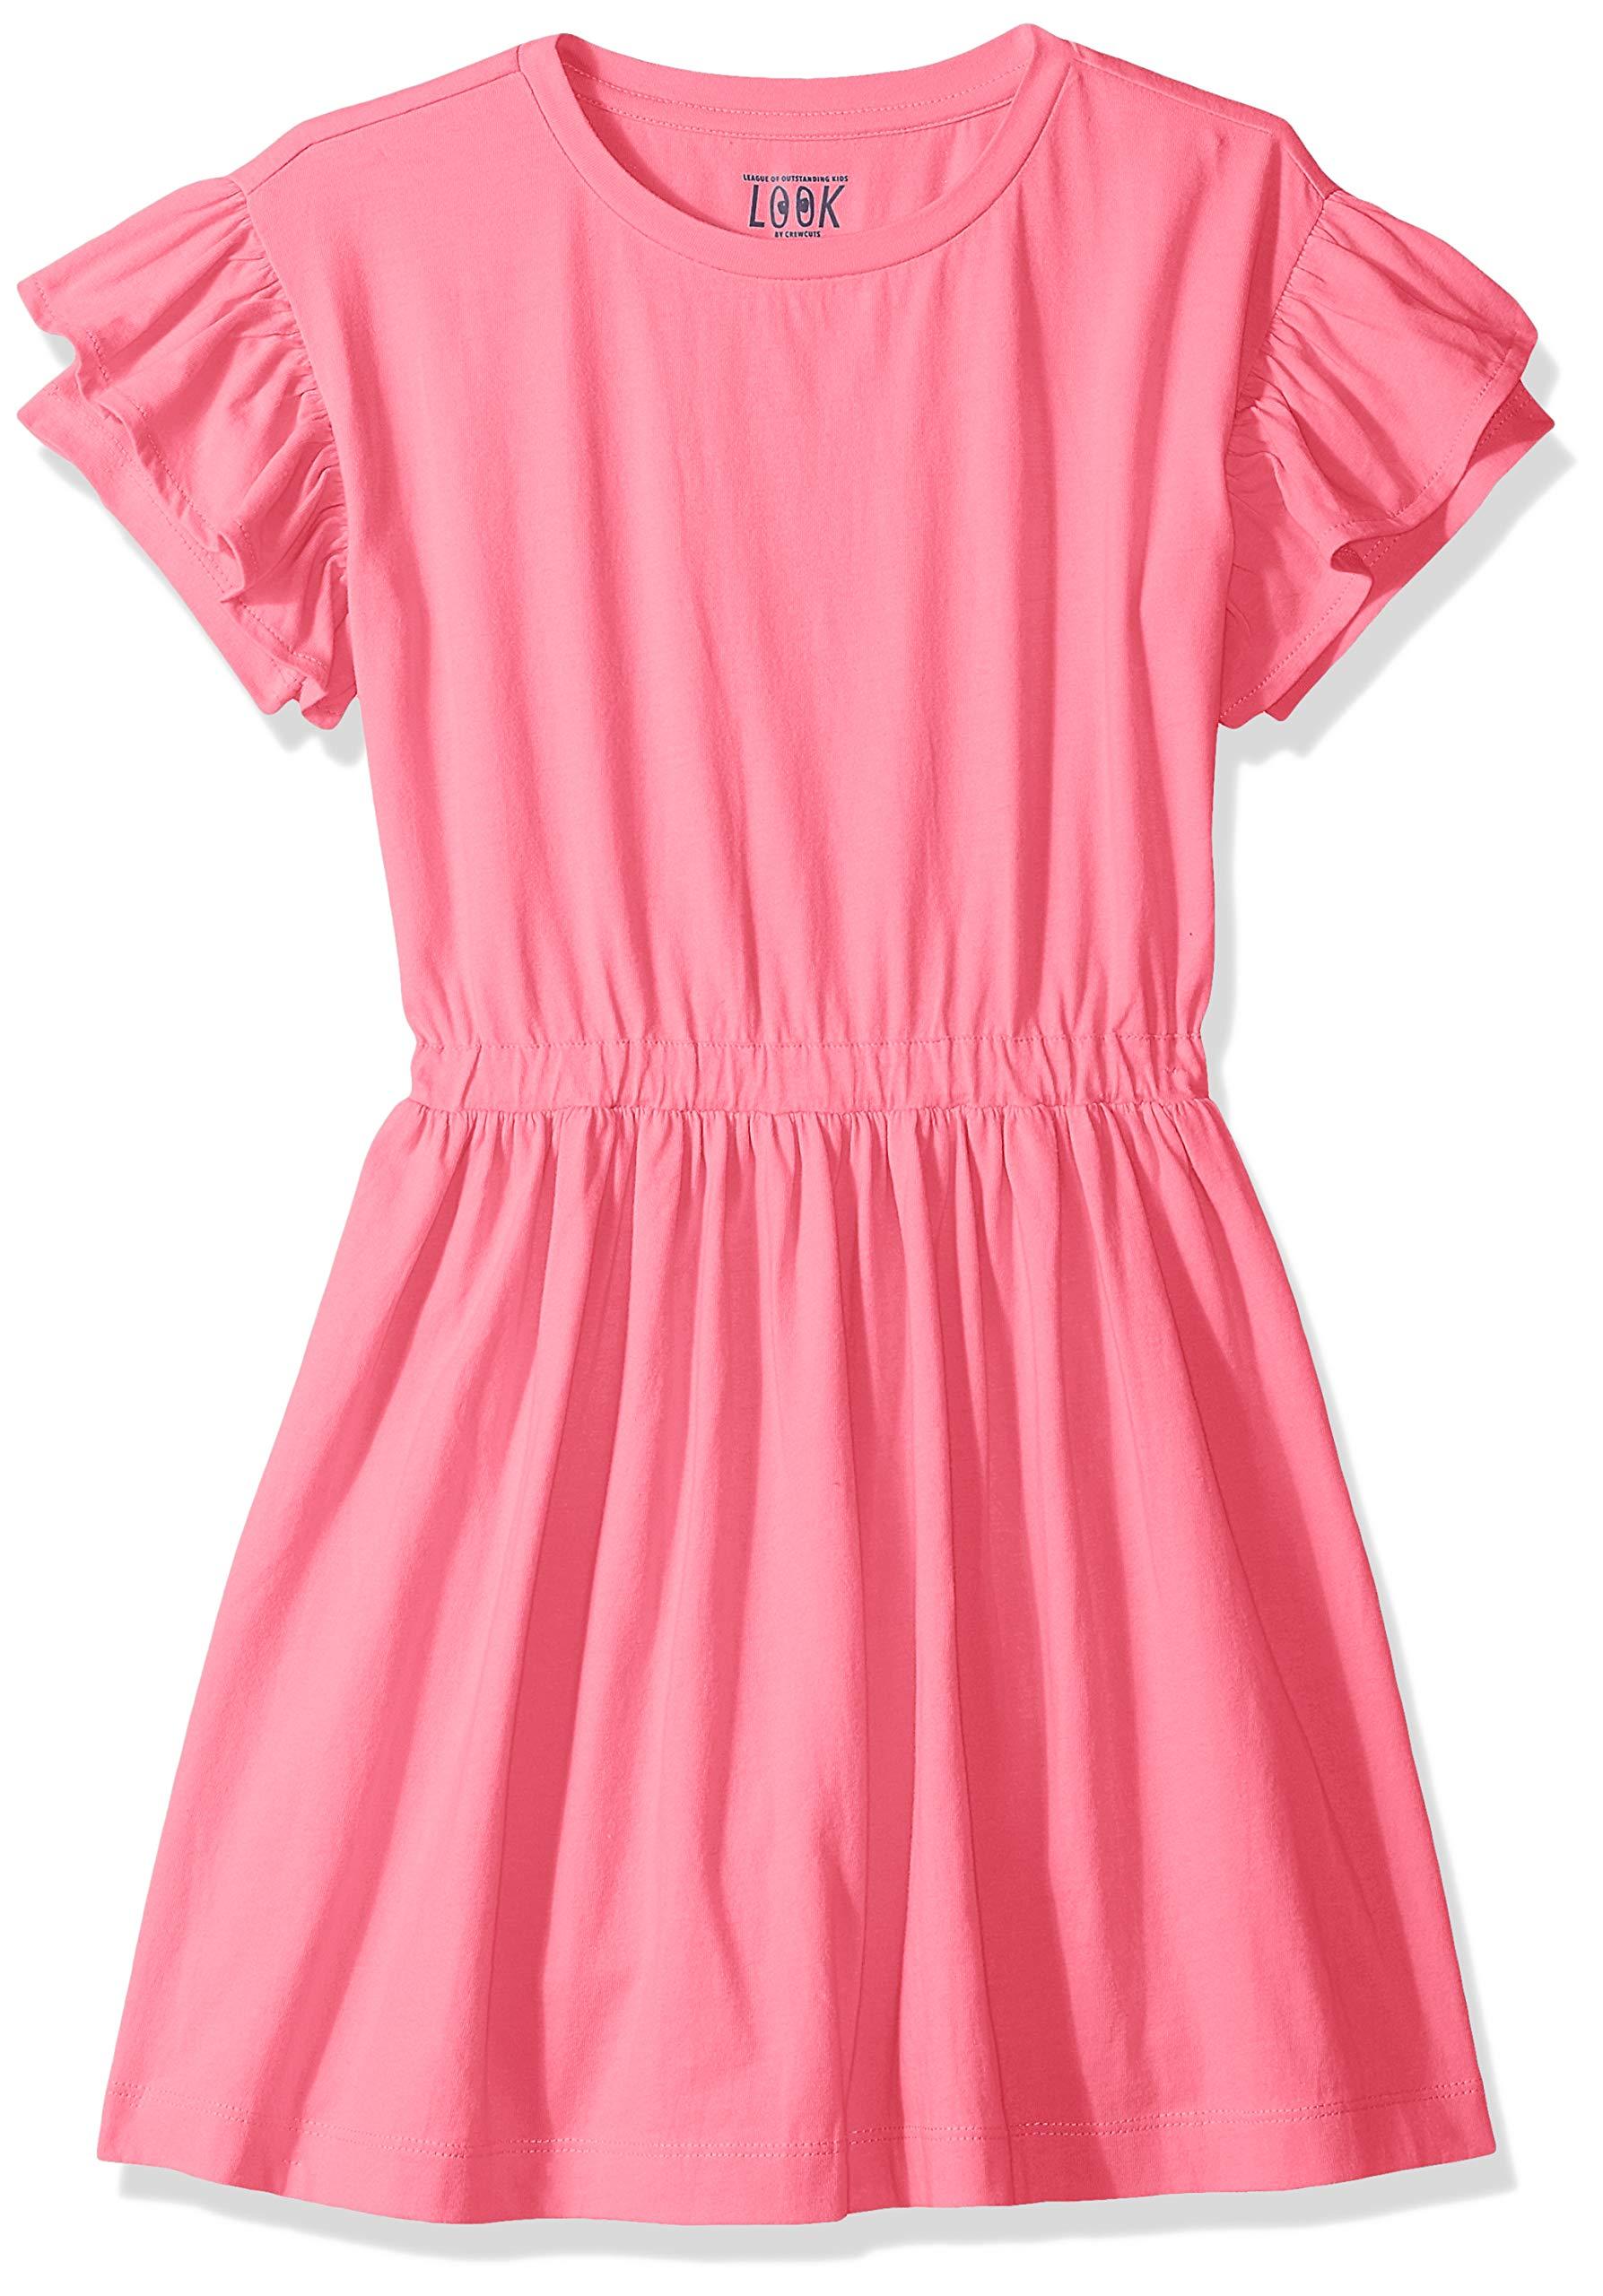 LOOK by crewcuts Girls Ruffle Sleeve Dress Dress